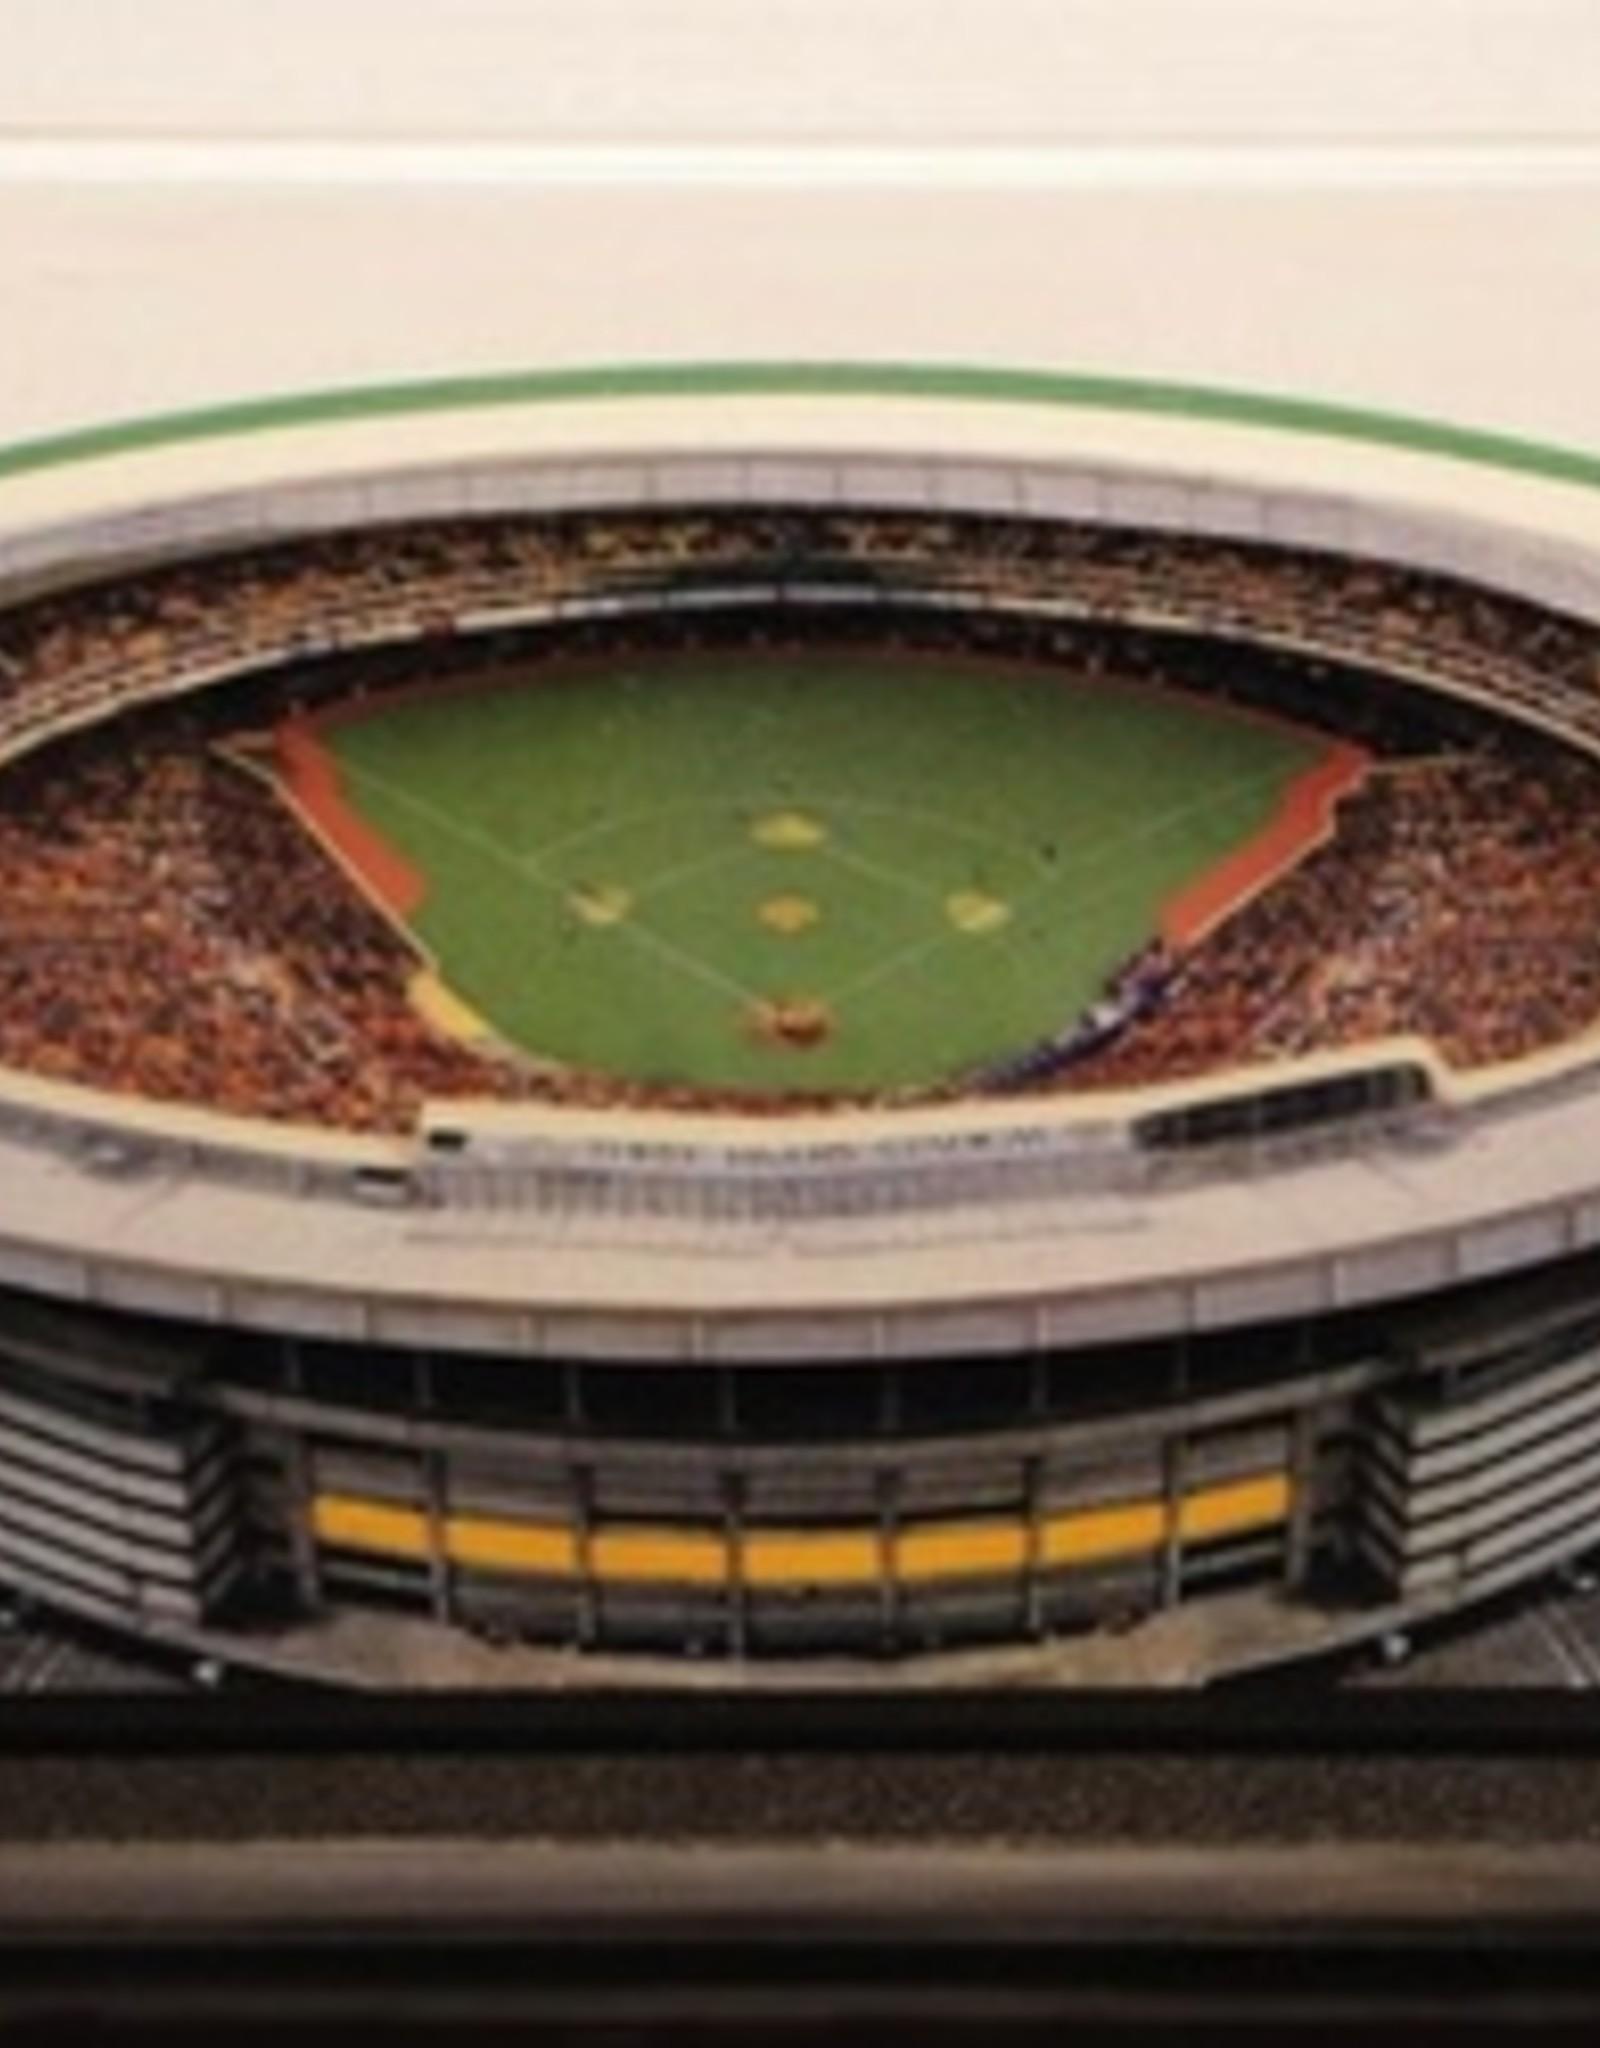 HOMEFIELDS Pittsburgh Pirates 13IN Lighted Replica Three Rivers Stadium (1970-2000)